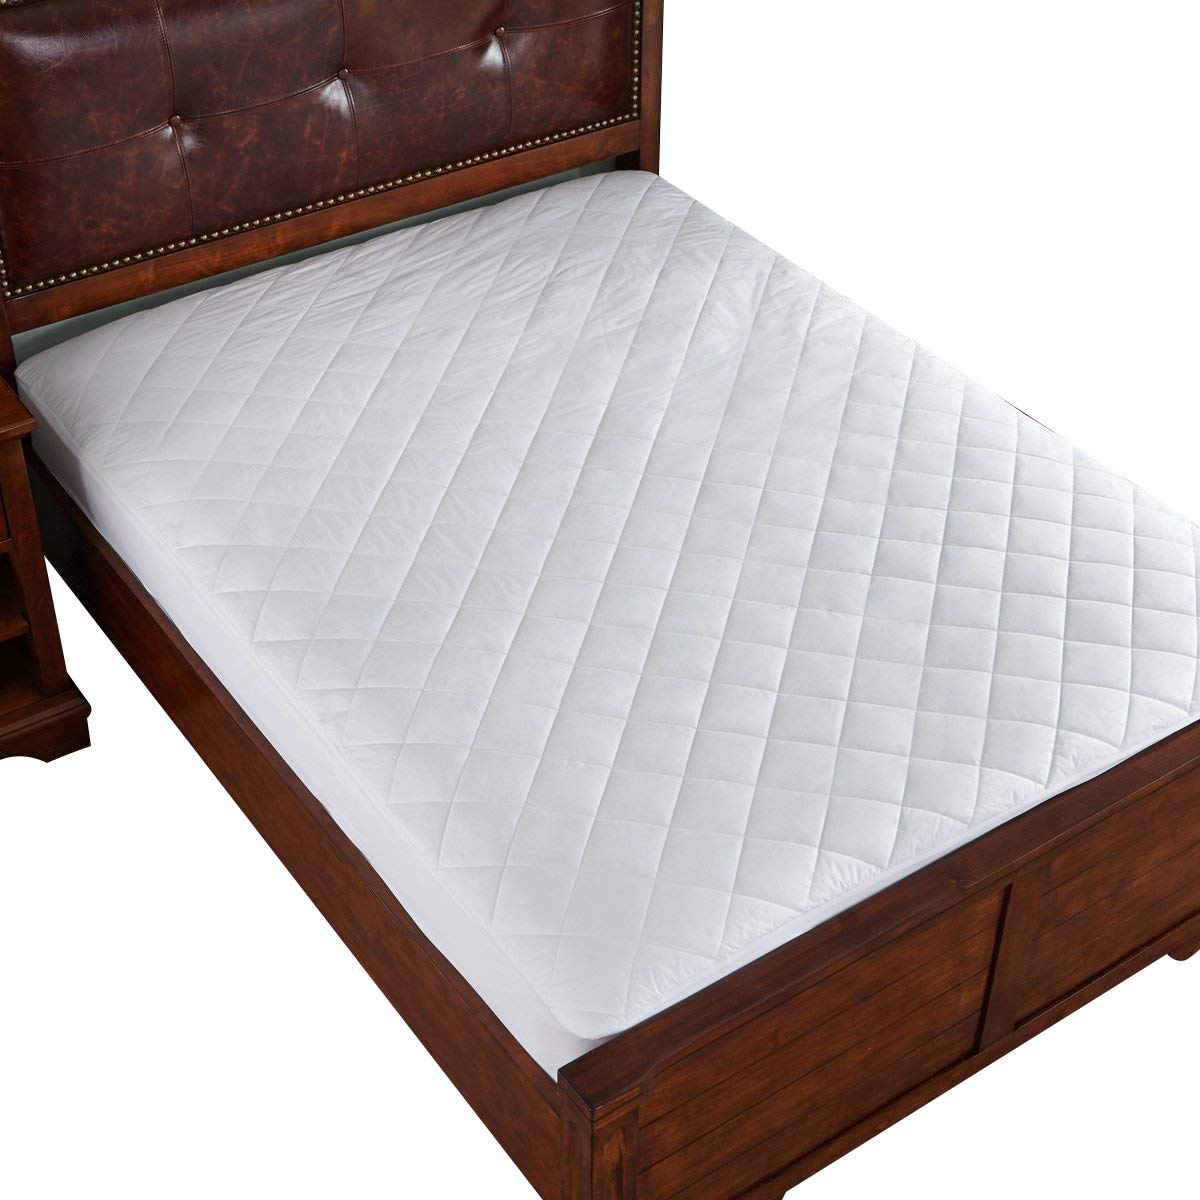 Home Elements Waterproof Cotton Mattress Pad, Full Size